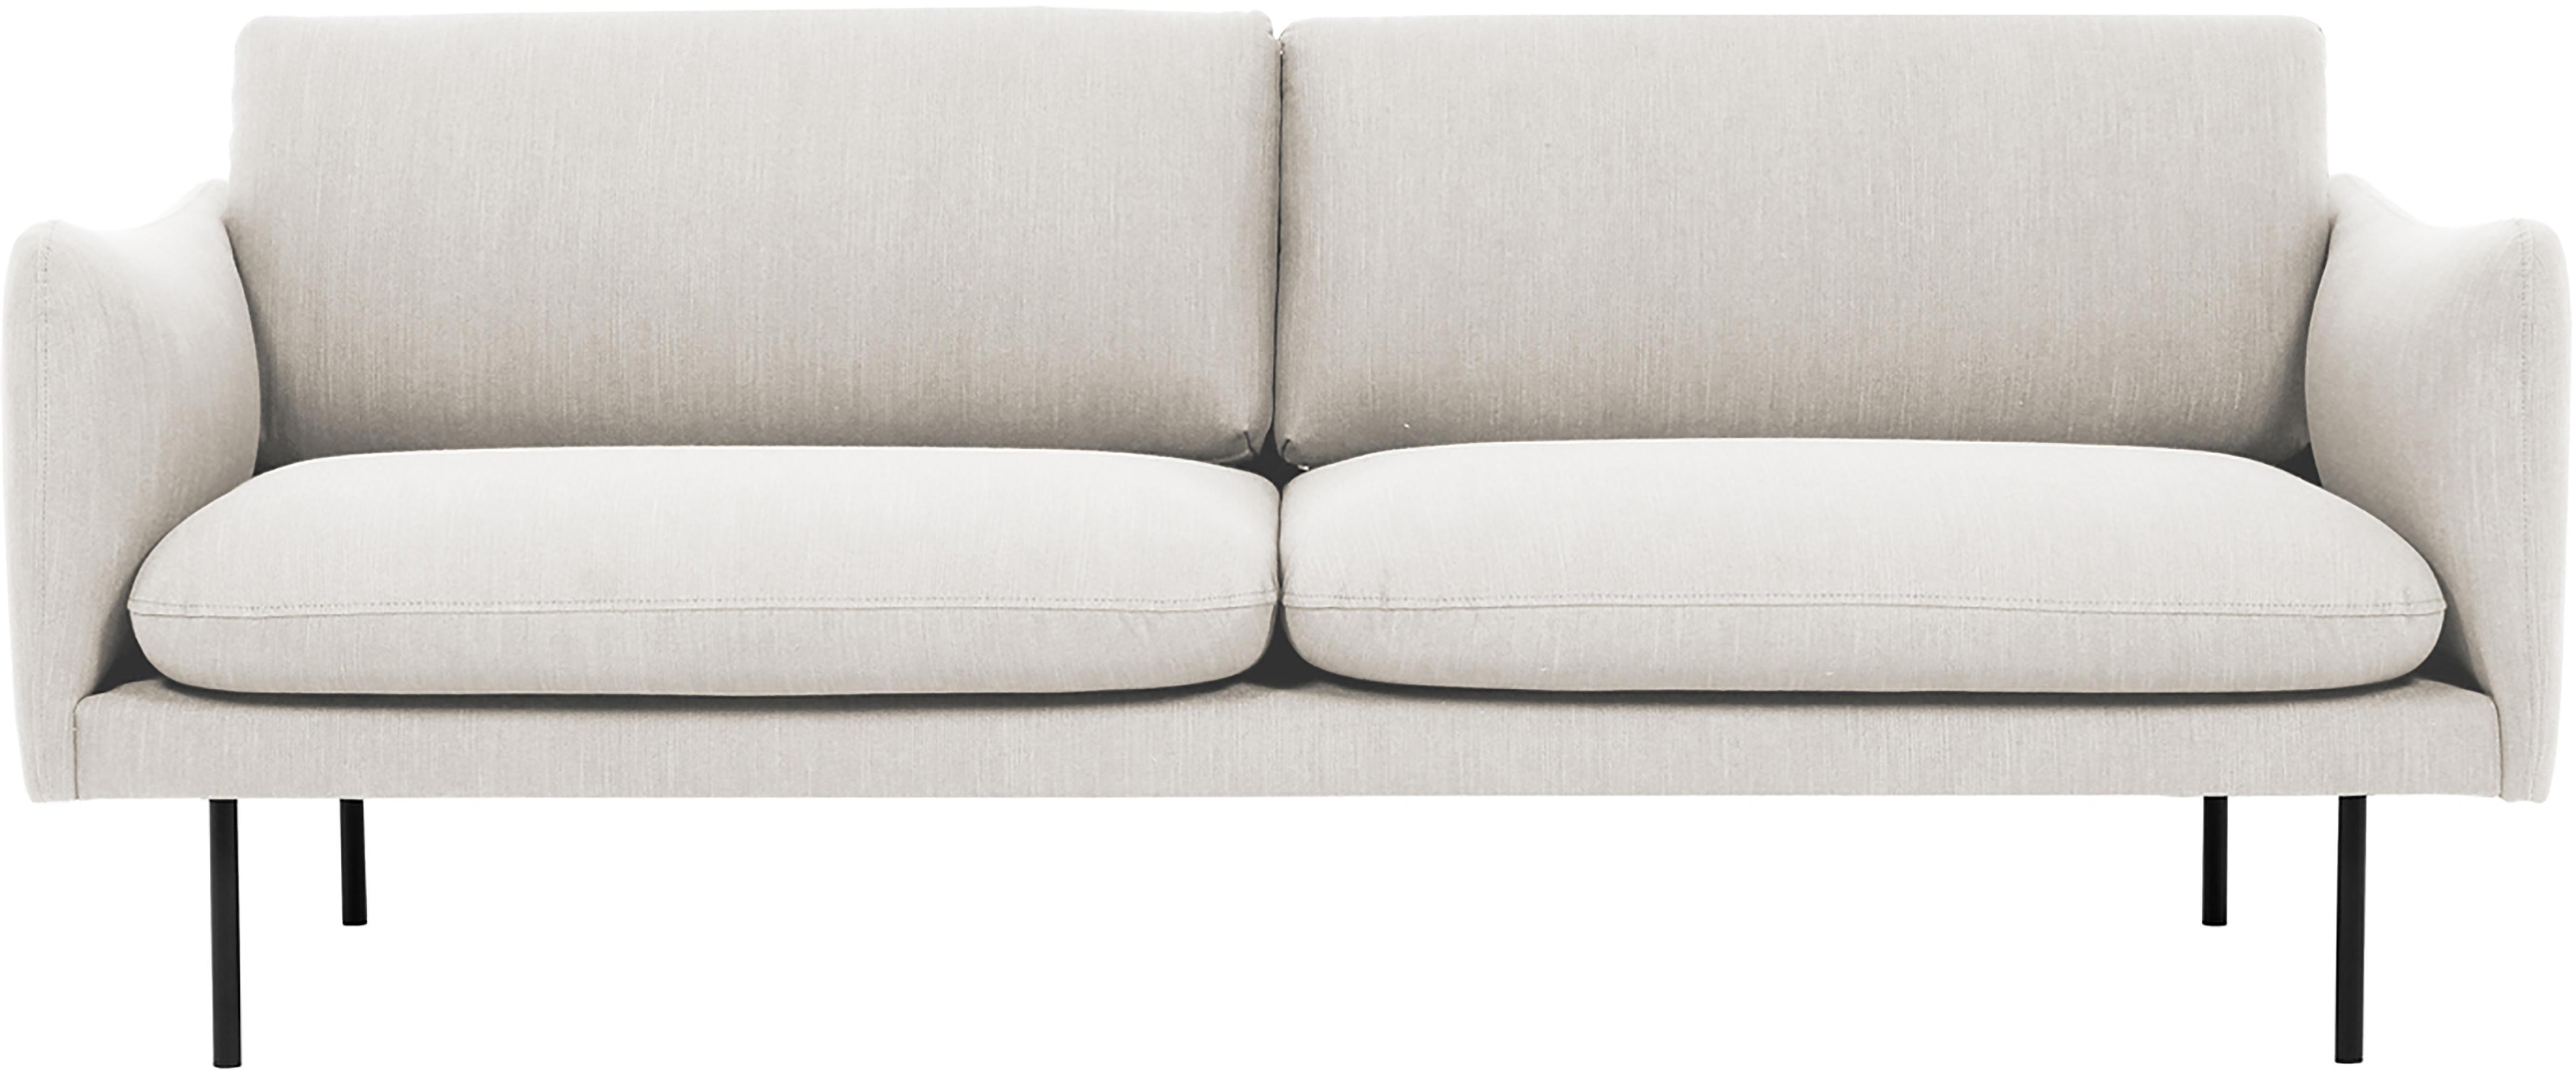 Sofa Moby (2-Sitzer), Bezug: Polyester Der hochwertige, Gestell: Massives Kiefernholz, Webstoff Beige, B 170 x T 95 cm